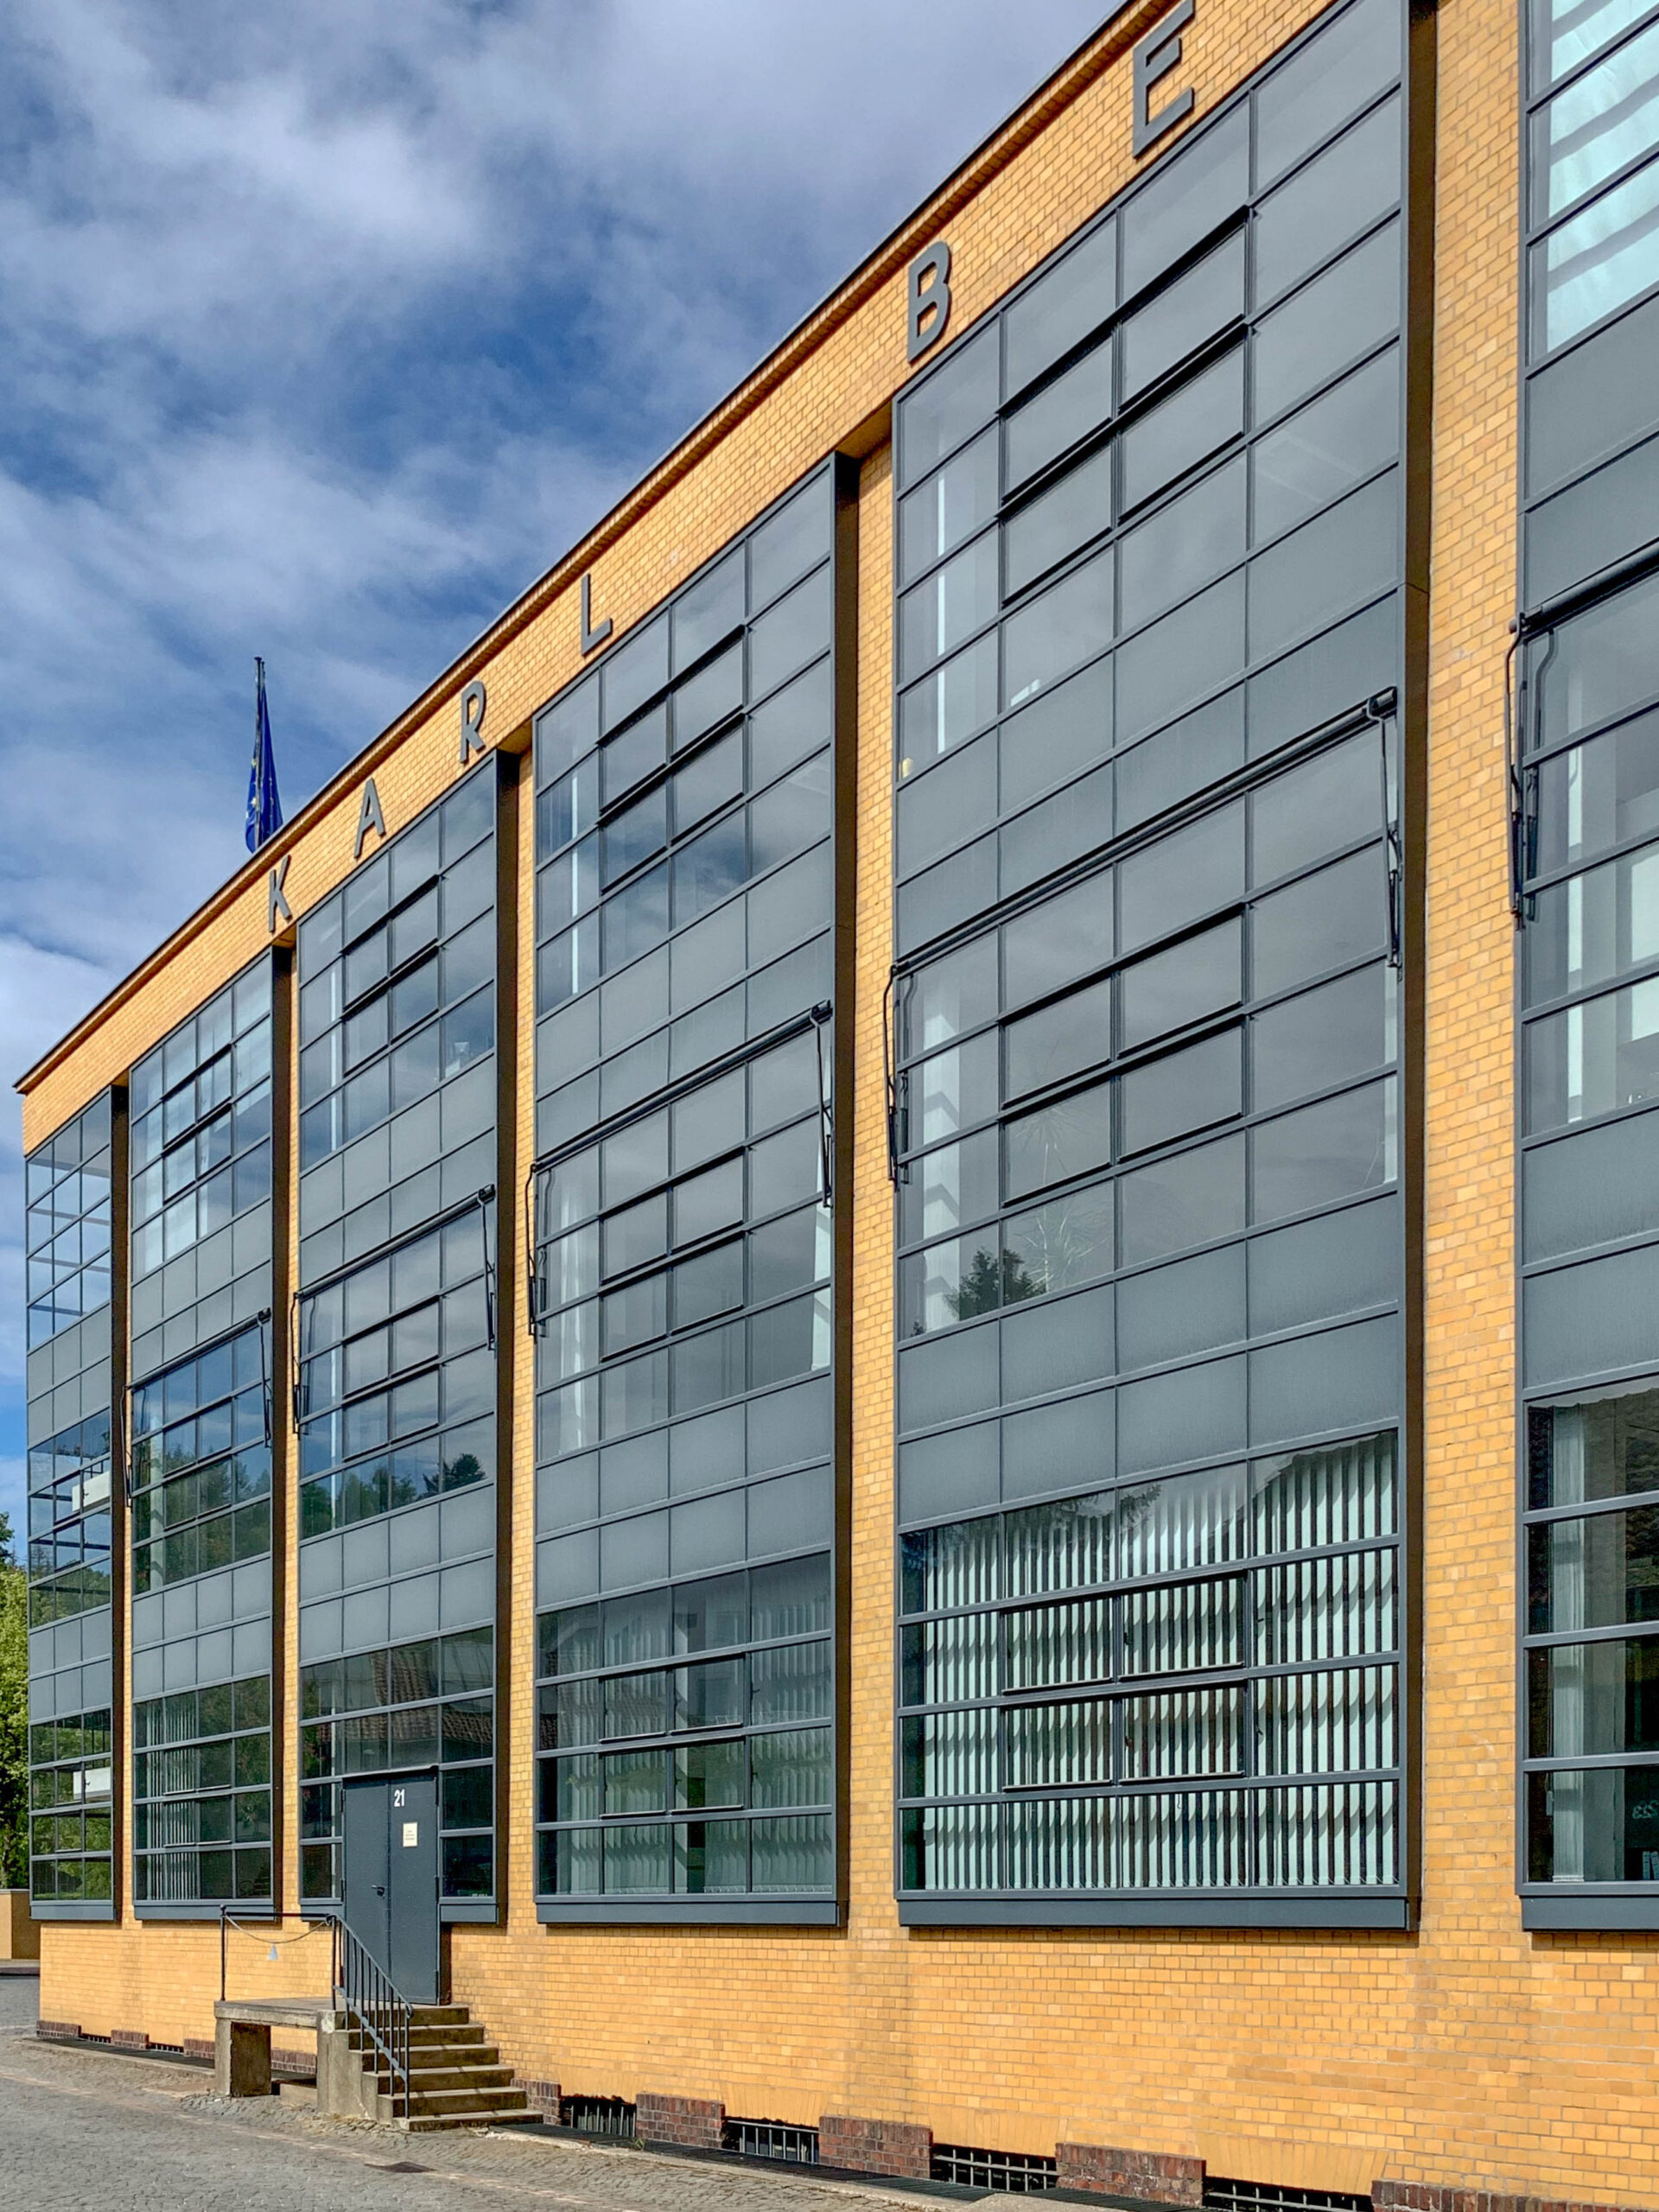 Fagus Factory, 1911-1915. Architects: Walter Gropius, Adolf Meyer